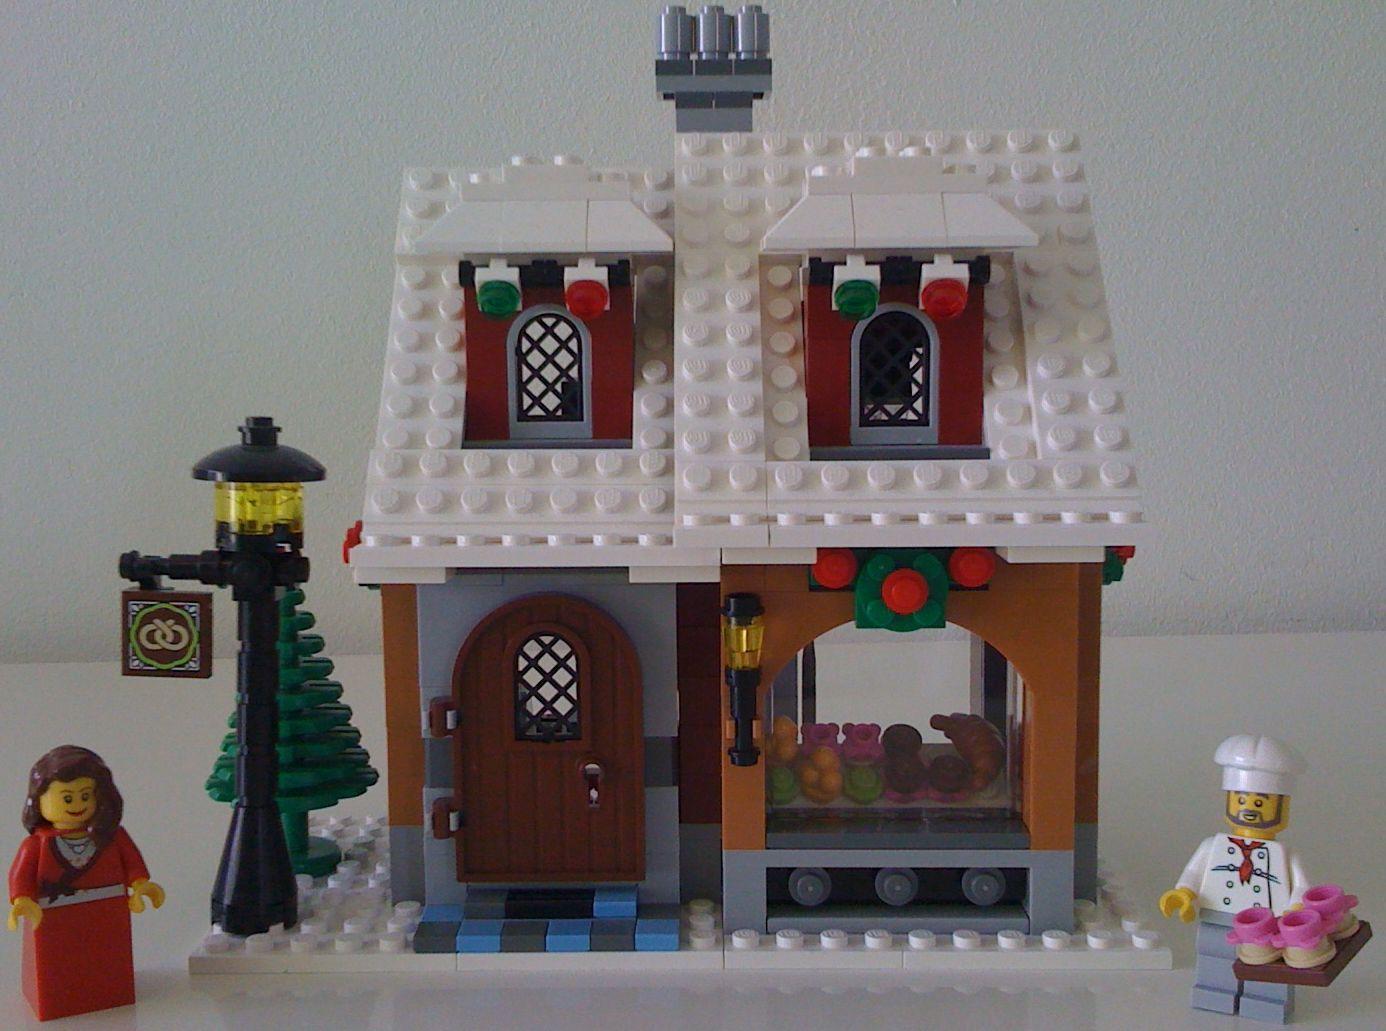 lego 10216 winter village bakery i brick city DoubleVerify TPS 10229 LEGO 10229